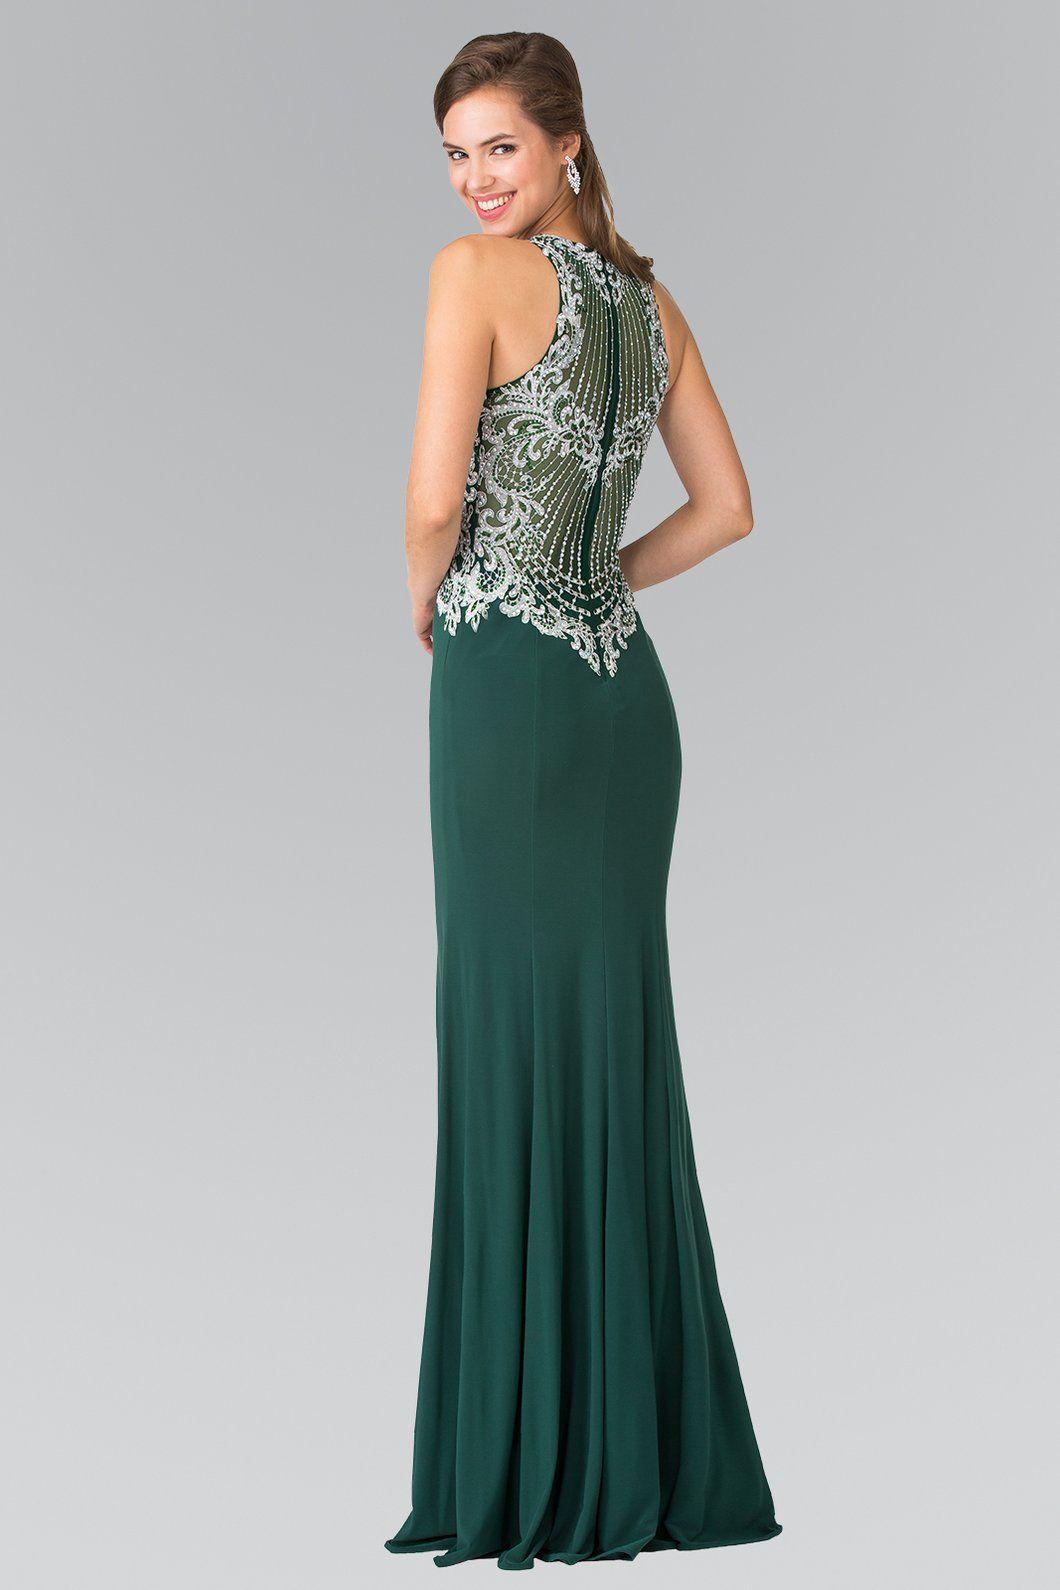 99dbdaff250 GLS GLS 2232 - High-Neck Prom Dress with Beaded Embroidered Illusion Bodice  - Diggz Prom